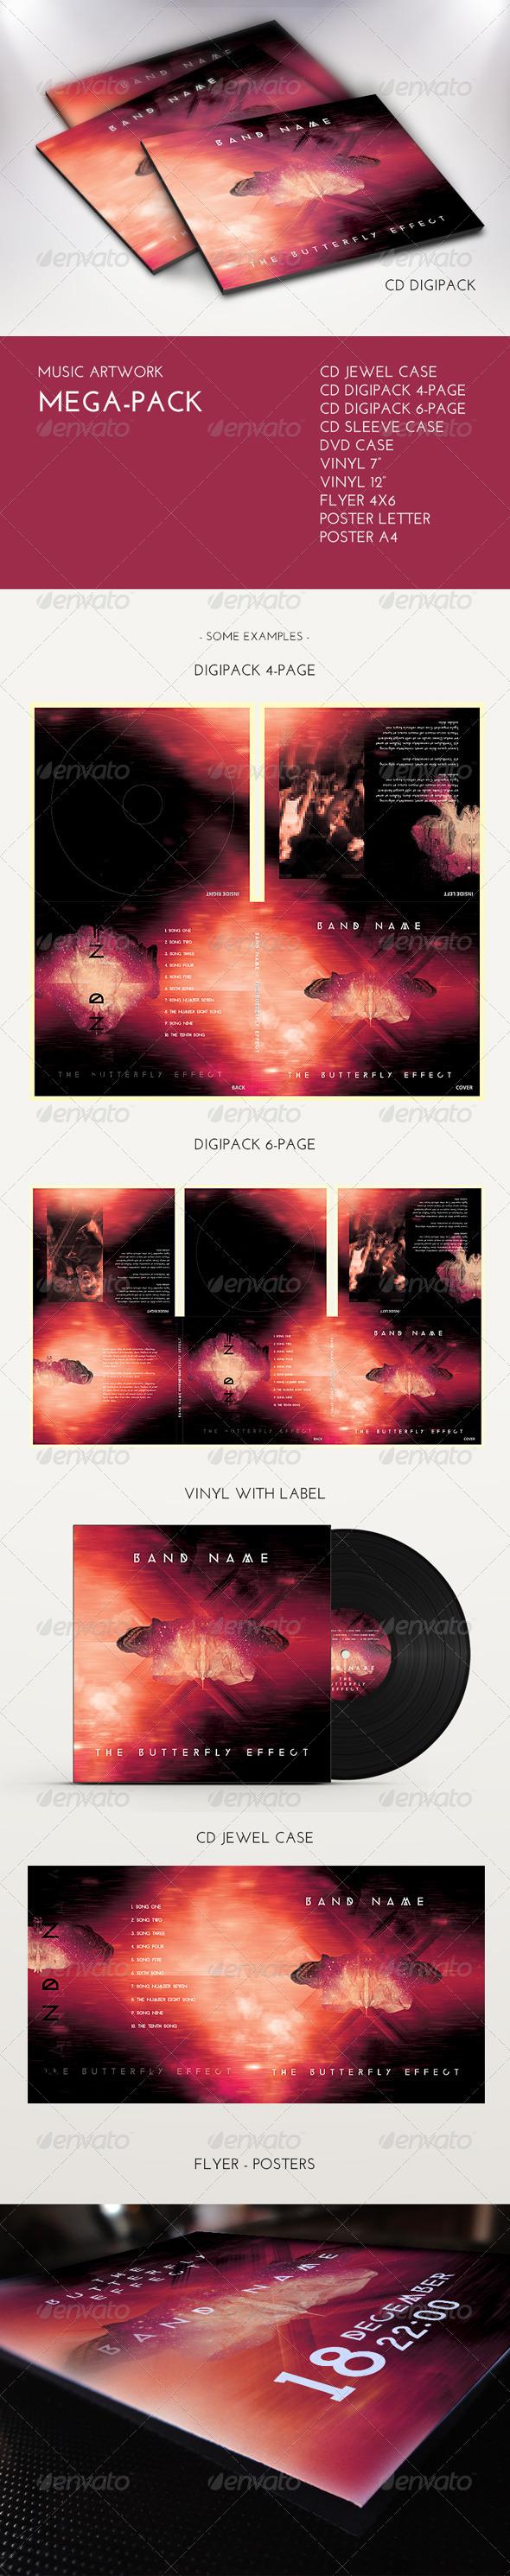 Music Artwork Mega Pack - CD & DVD Artwork Print Templates